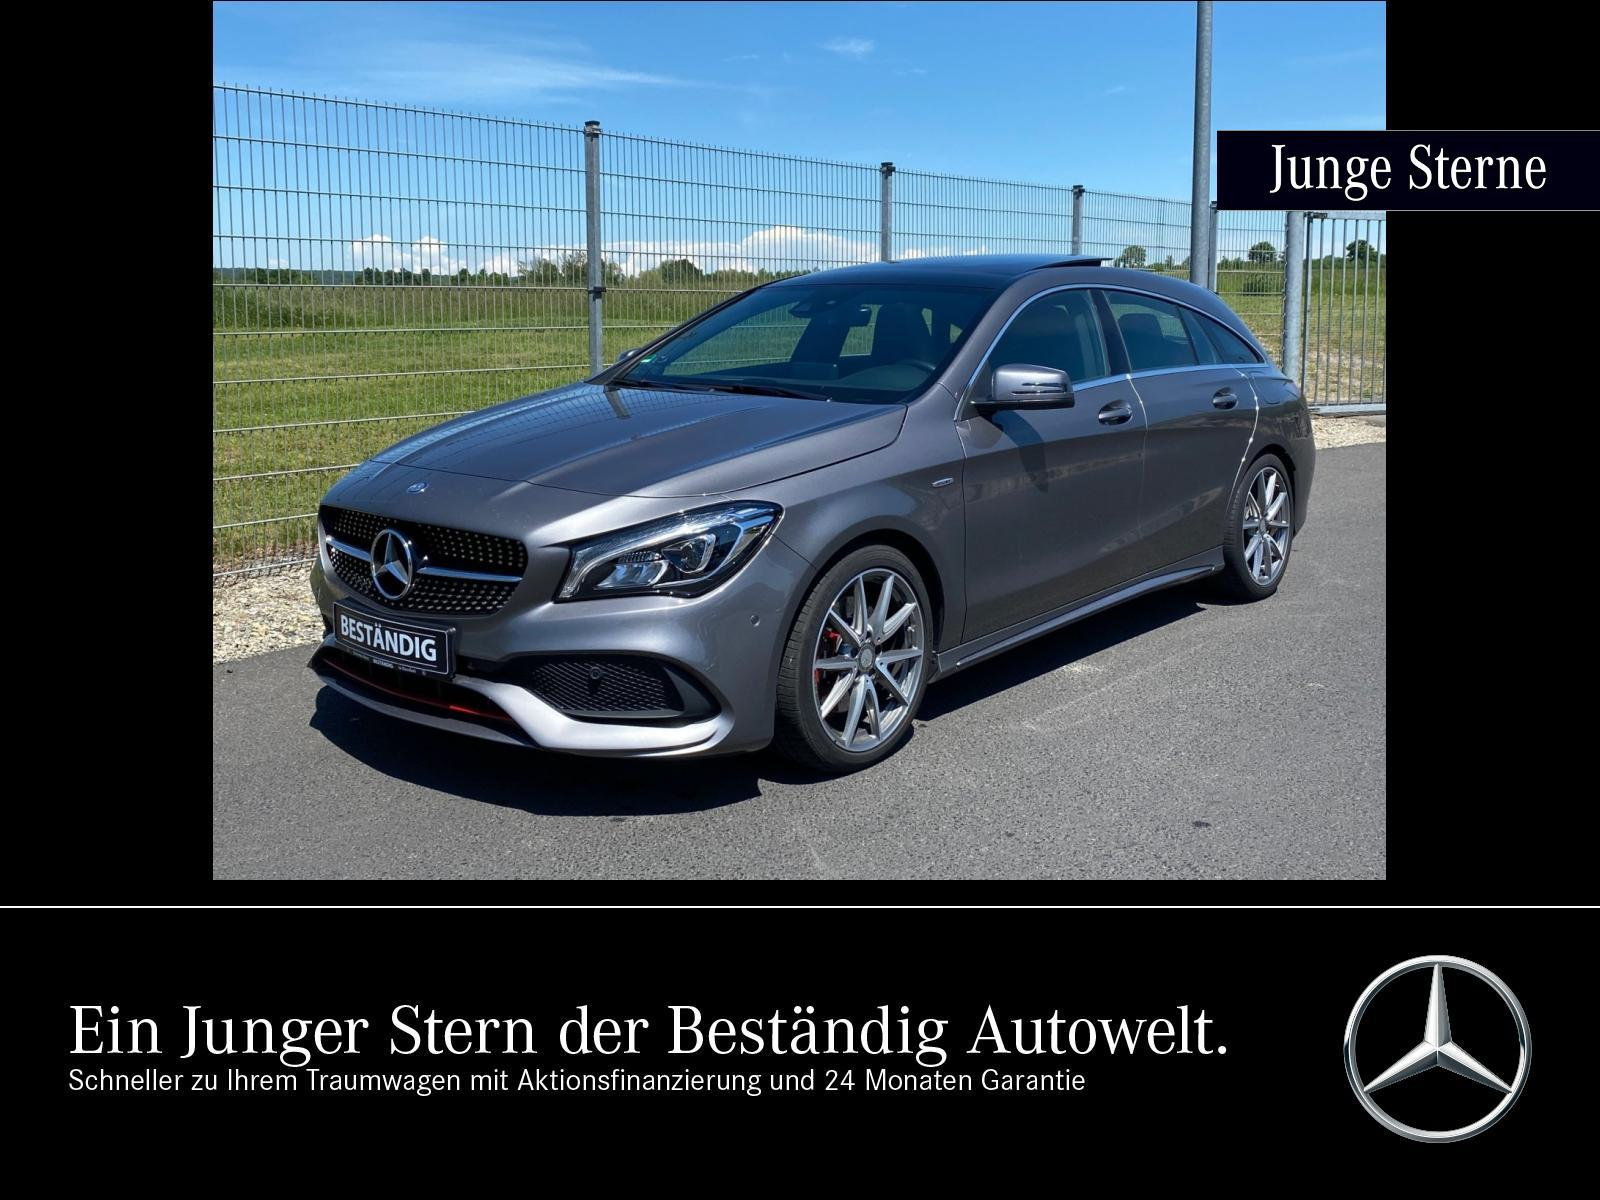 Mercedes-Benz CLA 250 Sport 4M SB AMG+LED+PANO+EASY-PACK+NAVI+, Jahr 2017, Benzin